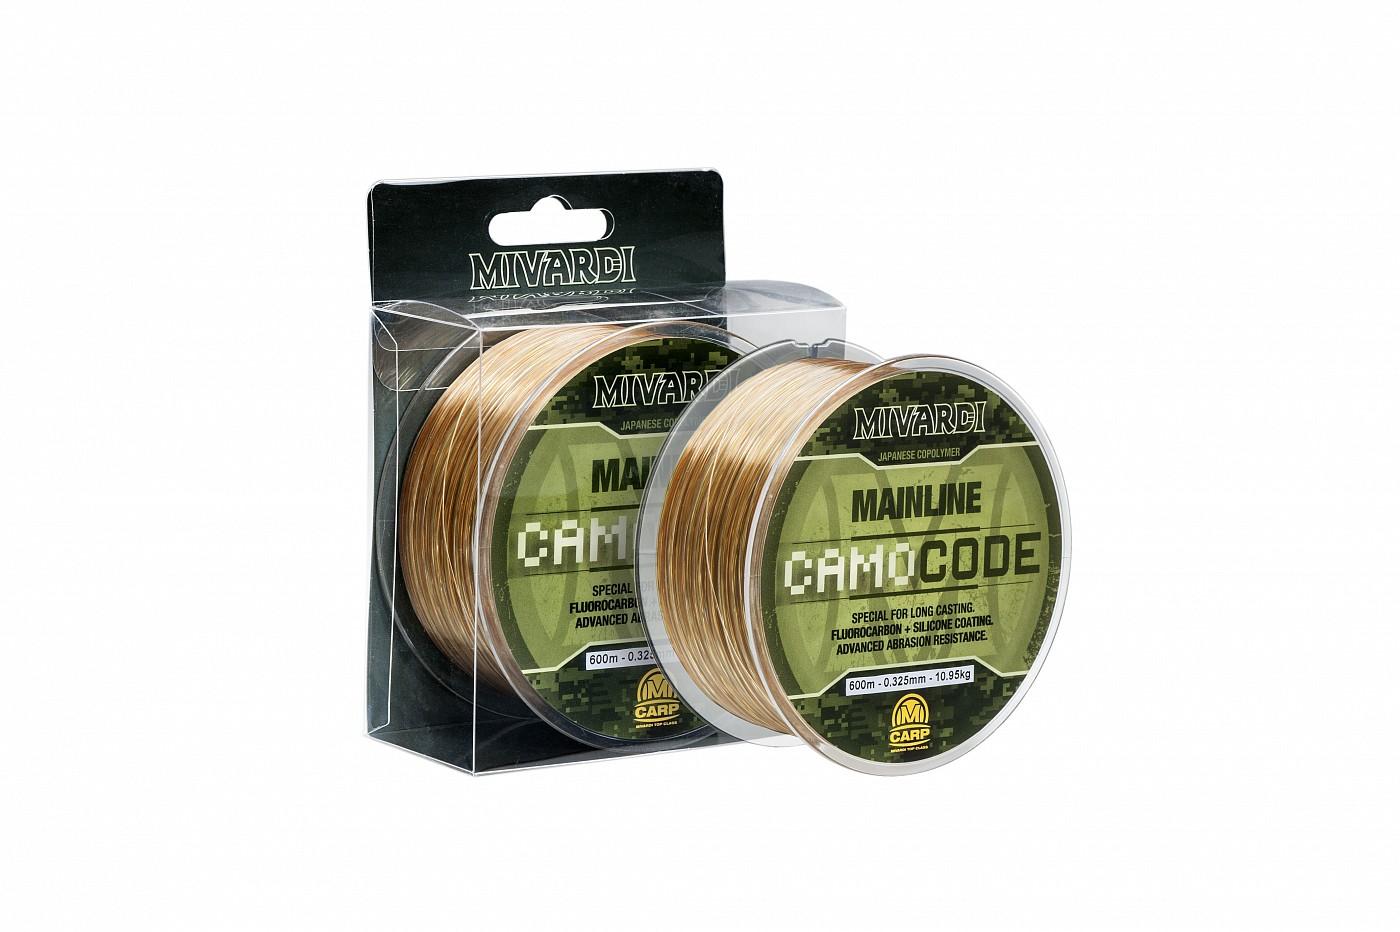 MIV-LCM12038 CamoCODE Mainline 0.385mm 1200m 1200m 0.385mm